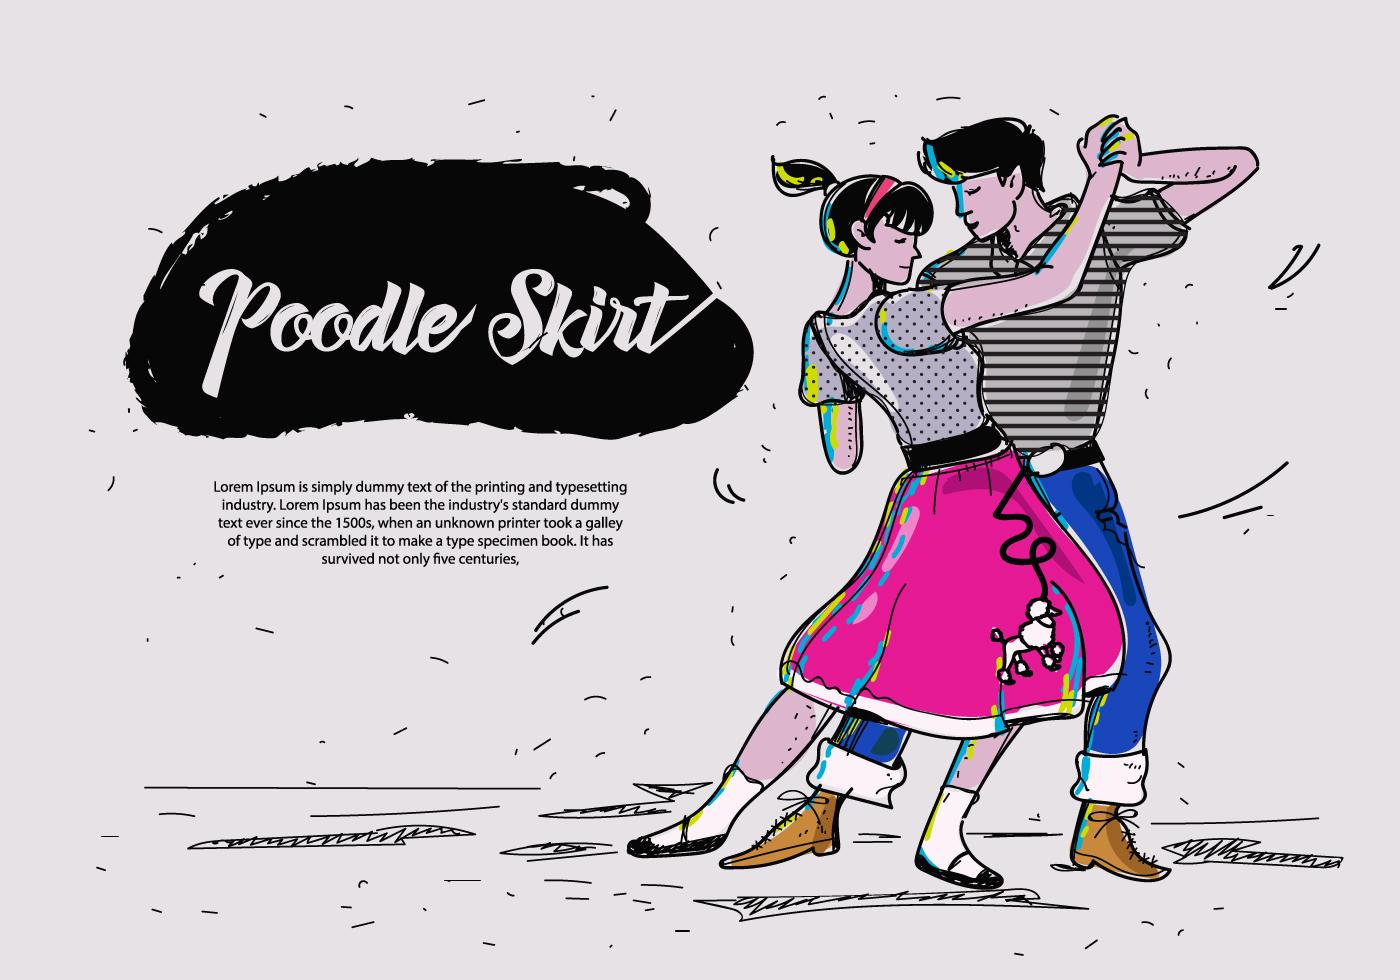 Poodle Skirt Dance Hand Drawn Vector Illustration.